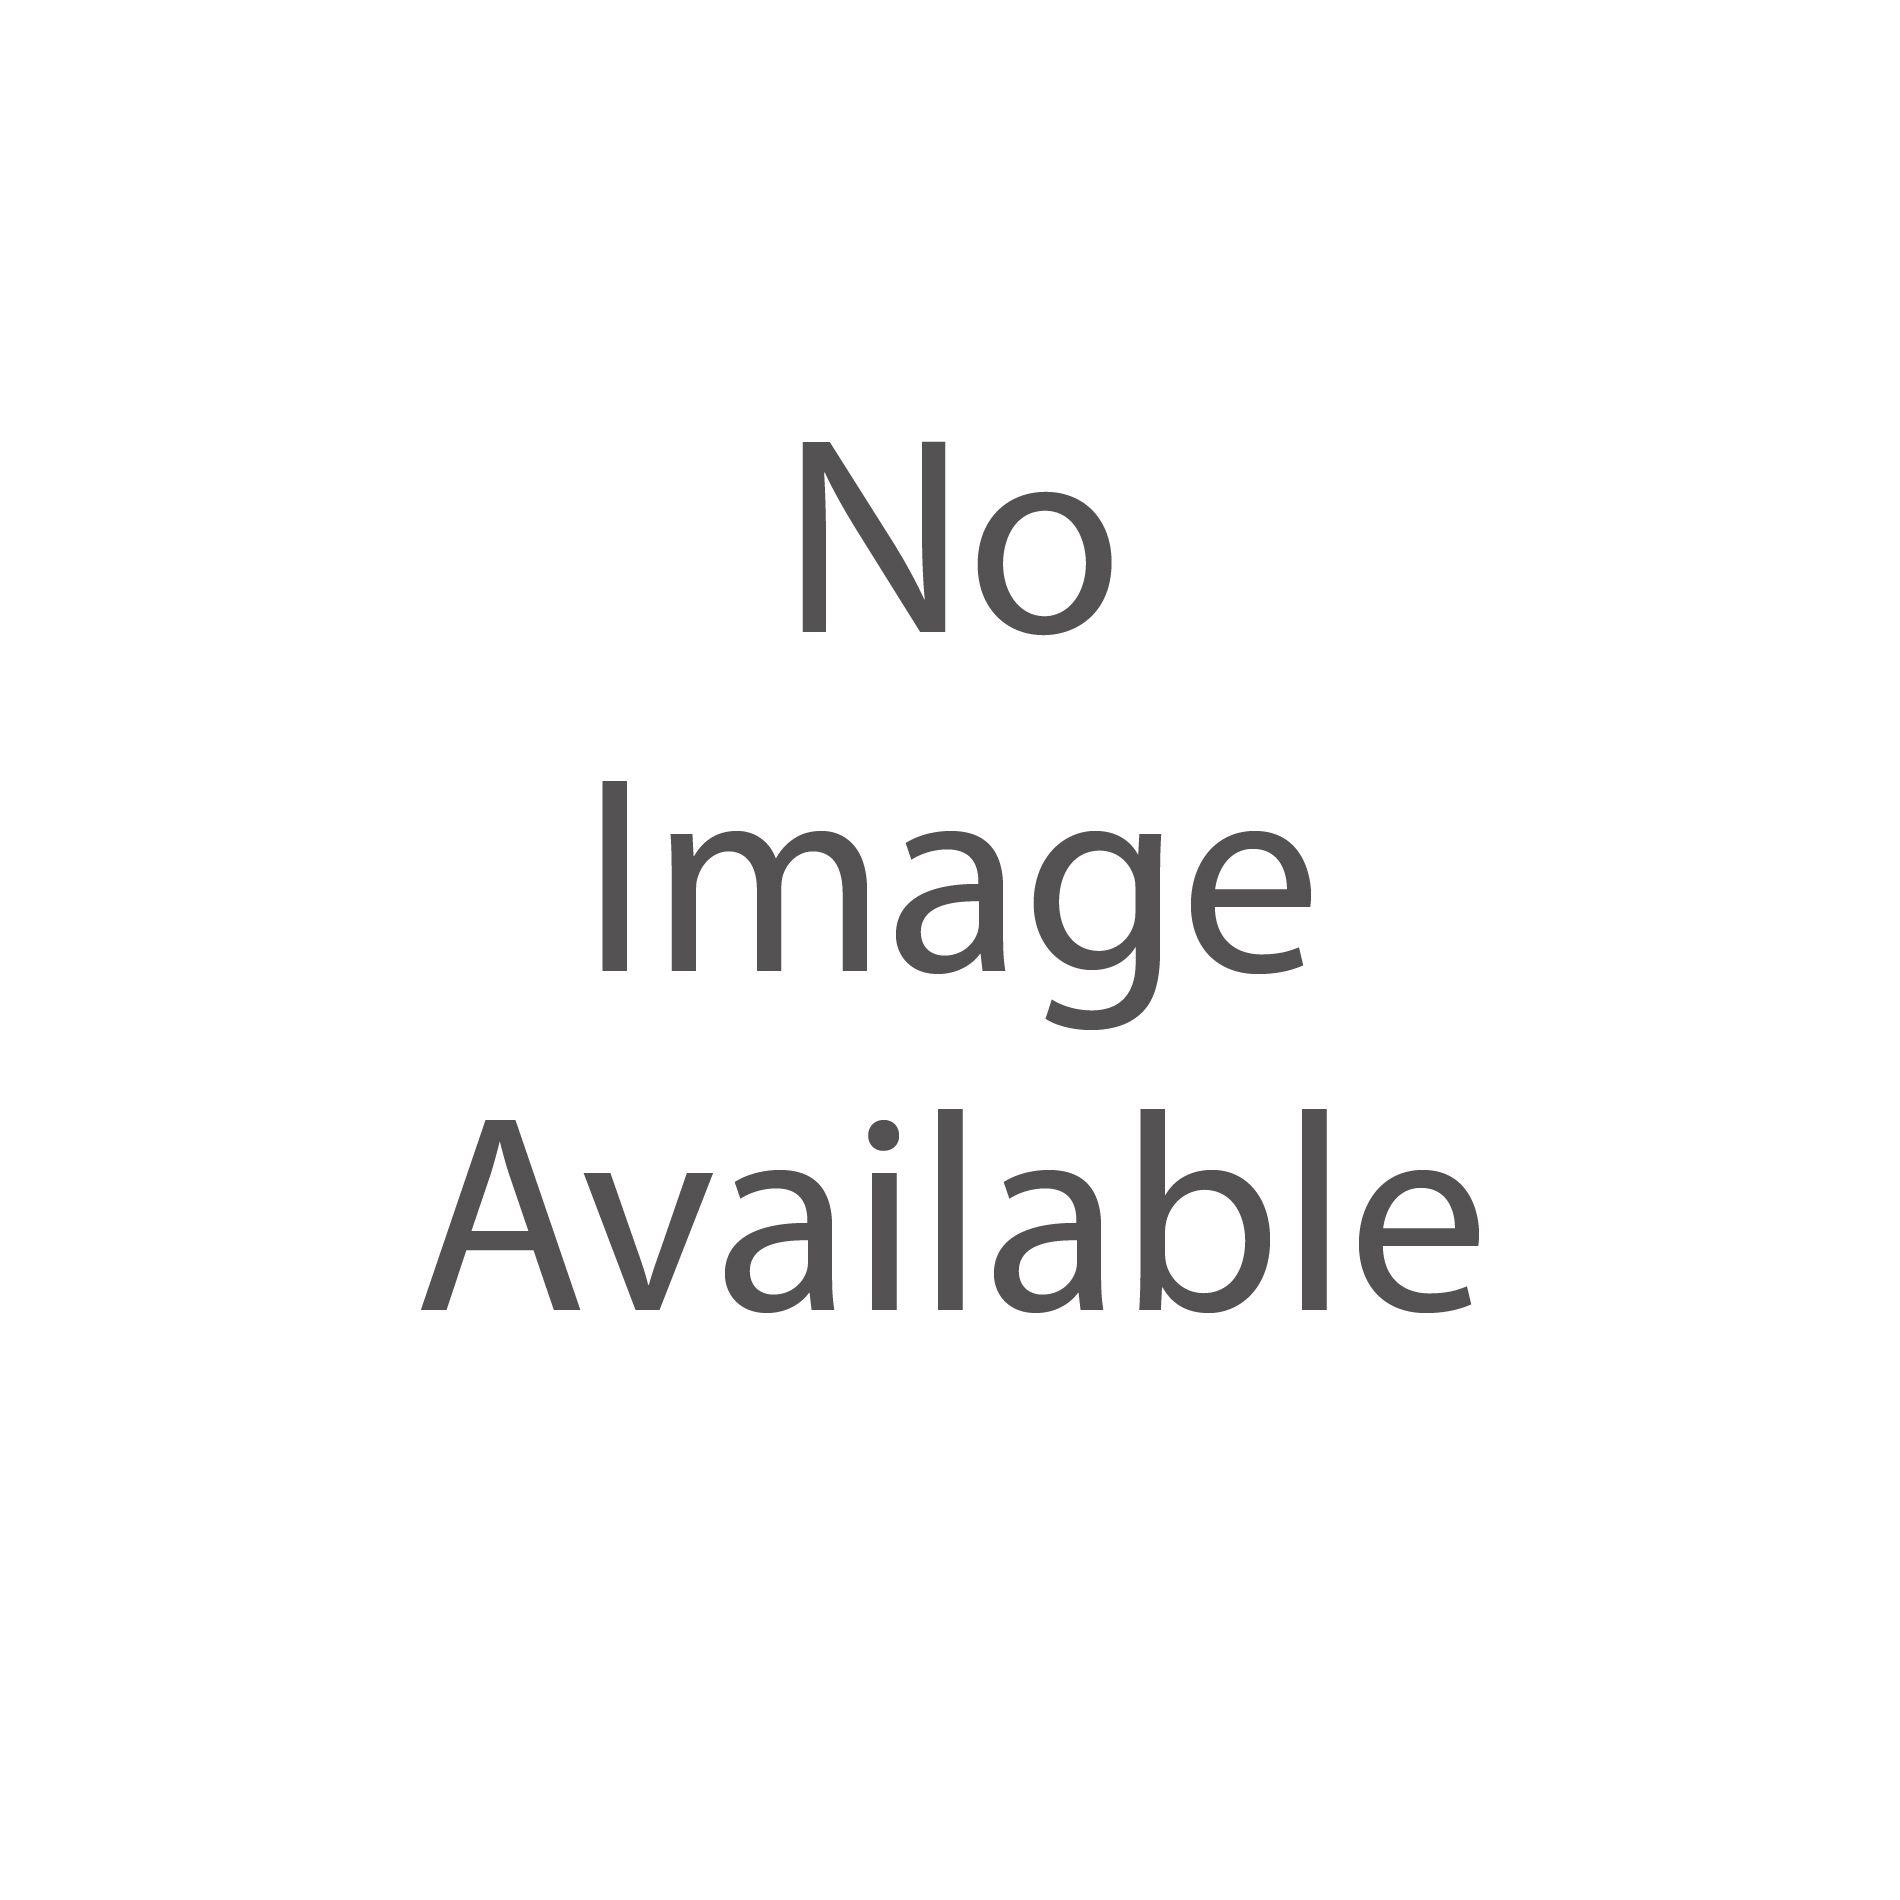 K-mart Fight Club DVD - Single Disk Edition PartNumber: 018W777502230001P KsnValue: 018W777502230001 MfgPartNumber: 2004479